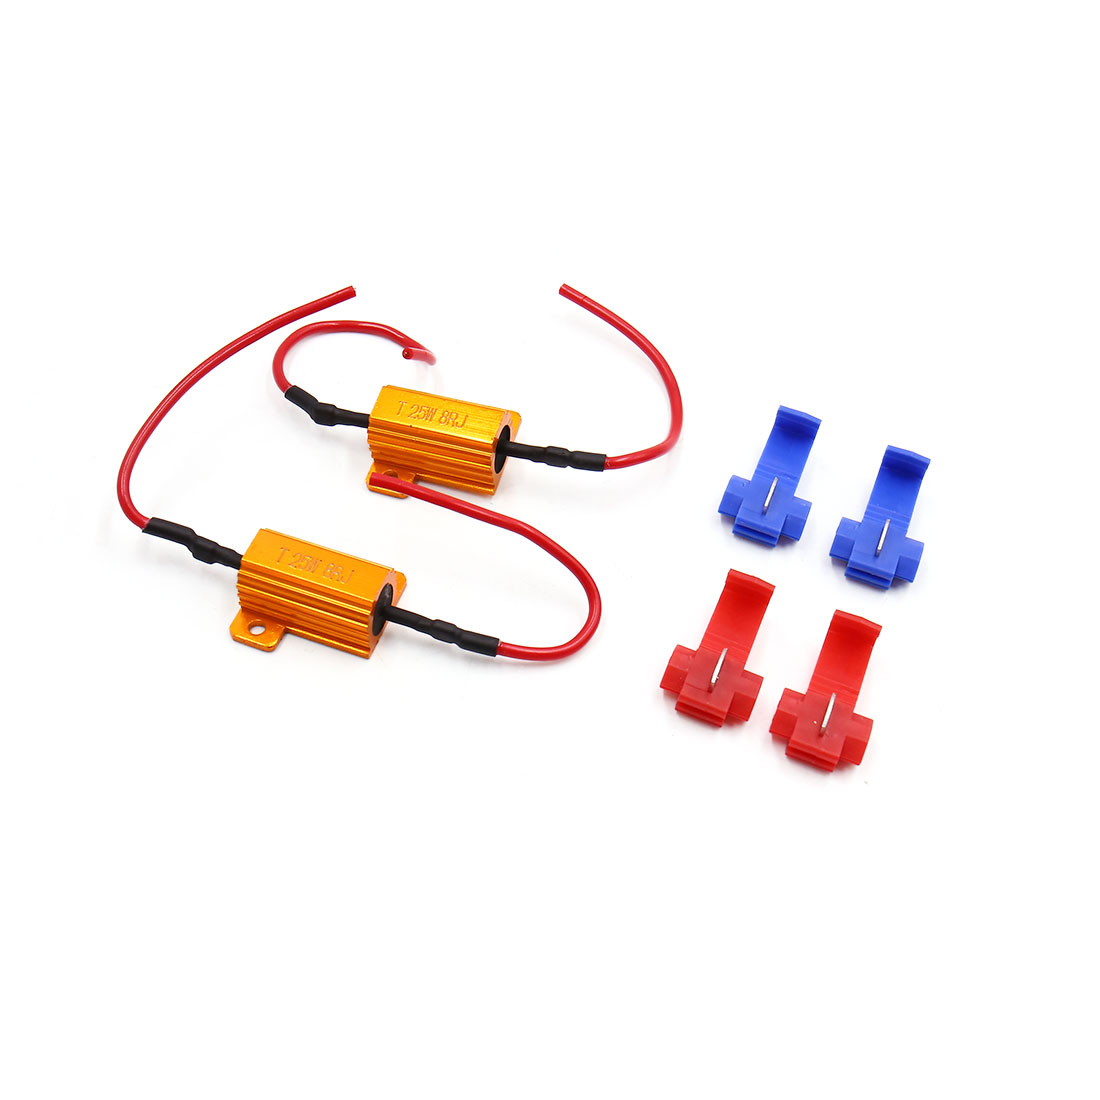 2Pcs 25W 8RJ LED Headlight Canbus Decoder No Error Free Load Resistor for Car